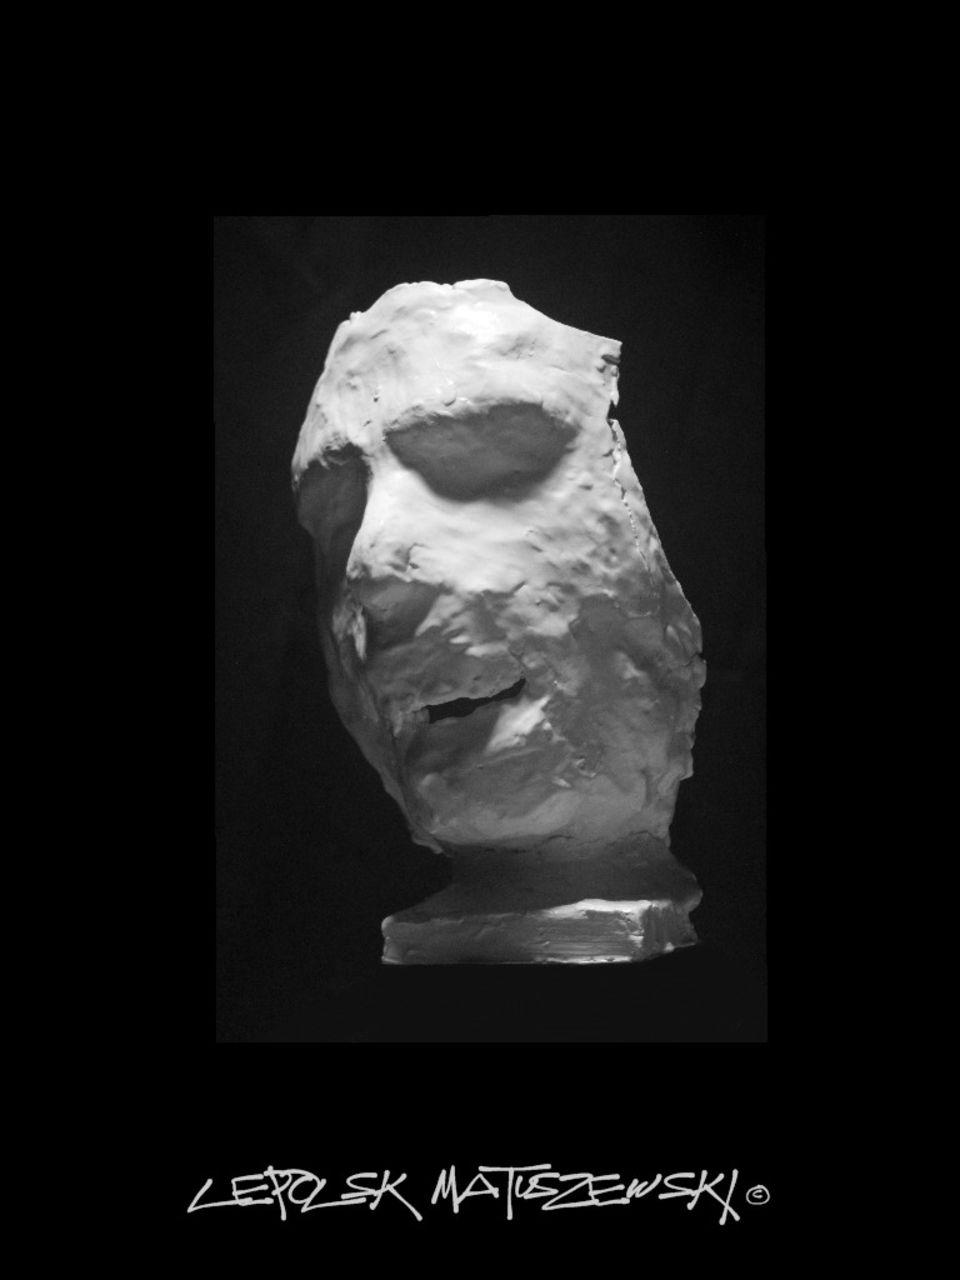 MISTER K  (Lepolsk Matuszewski) ANIMA  sculpture Lepolsk Matuszewski